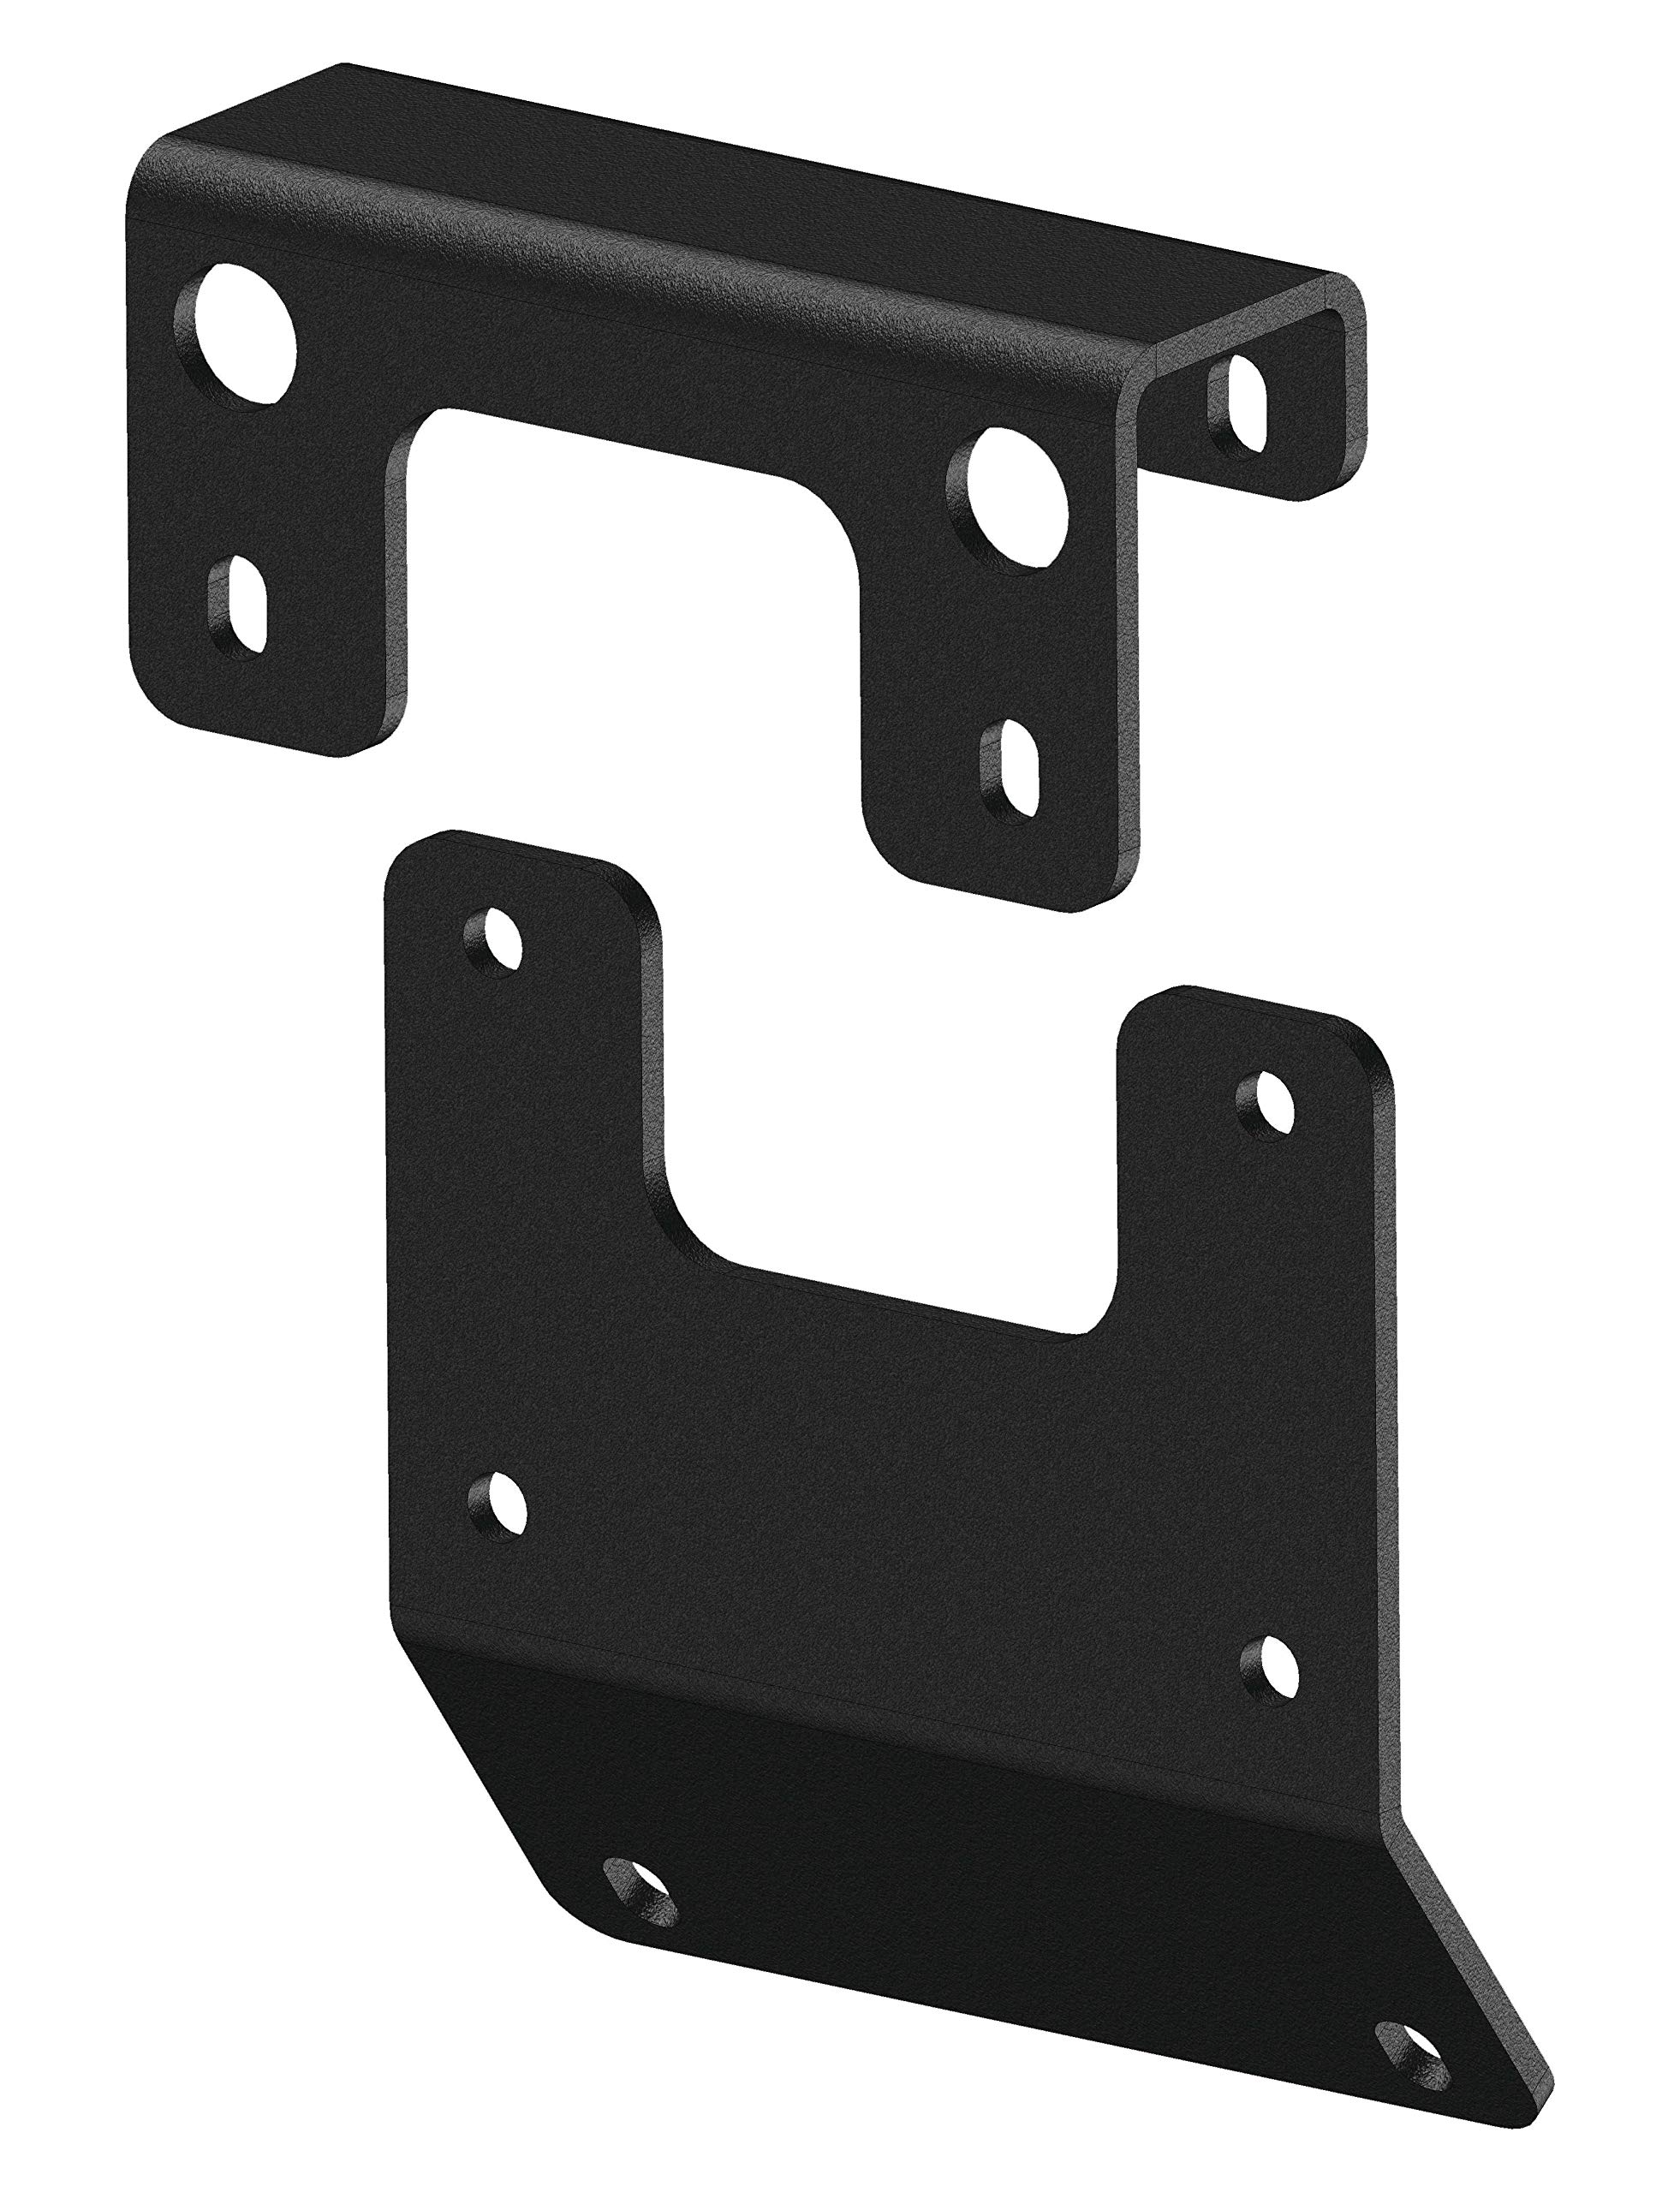 KFI SE45W-R2 Stealth Series Winch (4500lb)